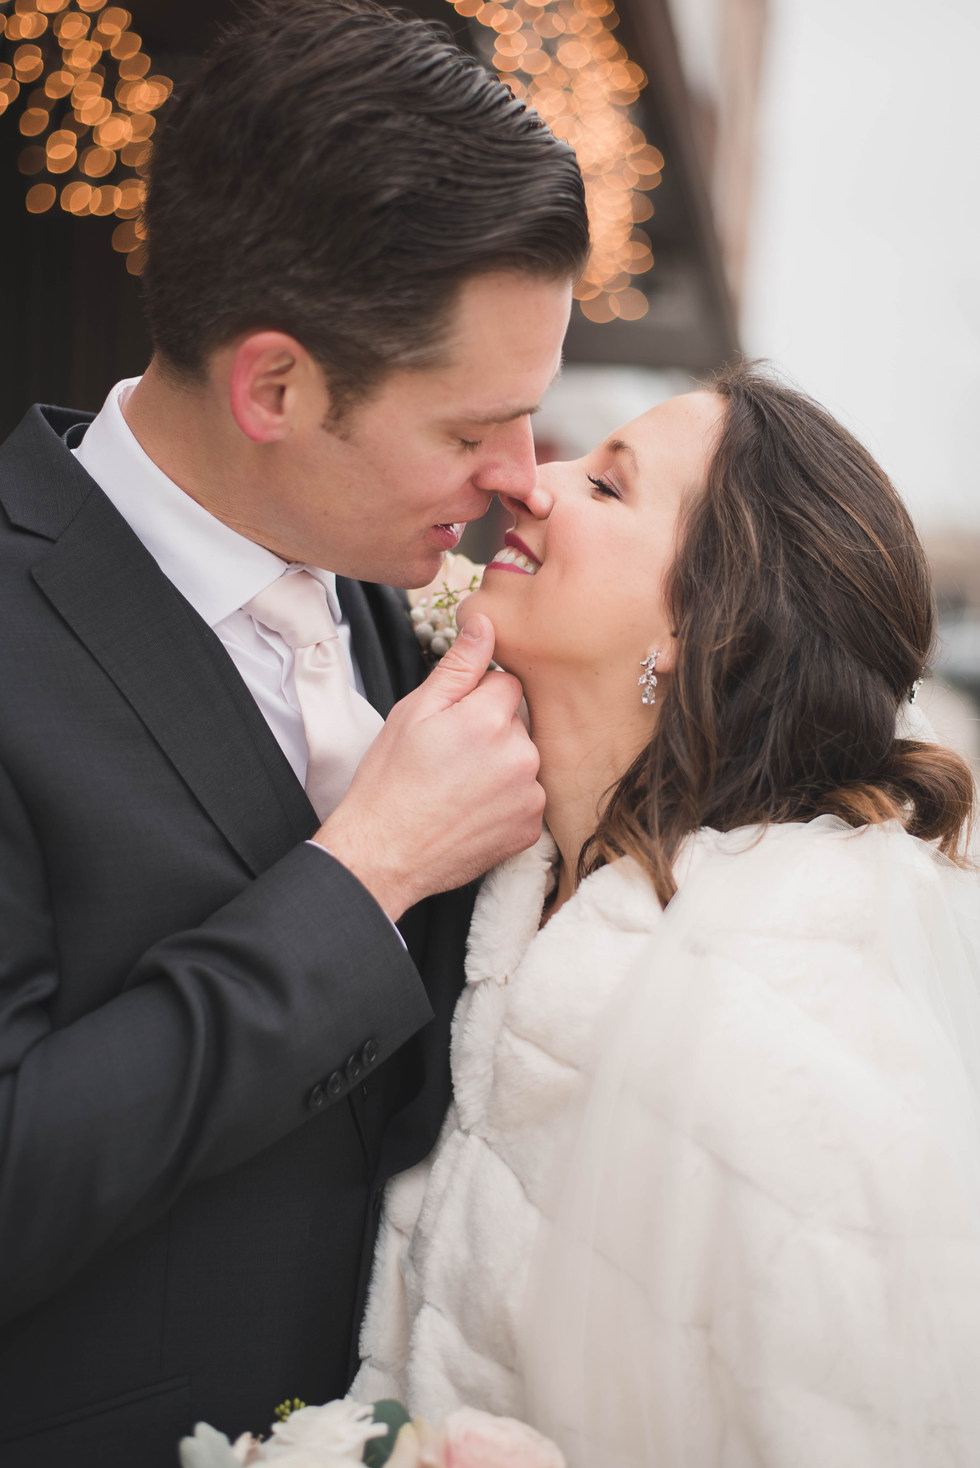 wedding photography-12.JPG